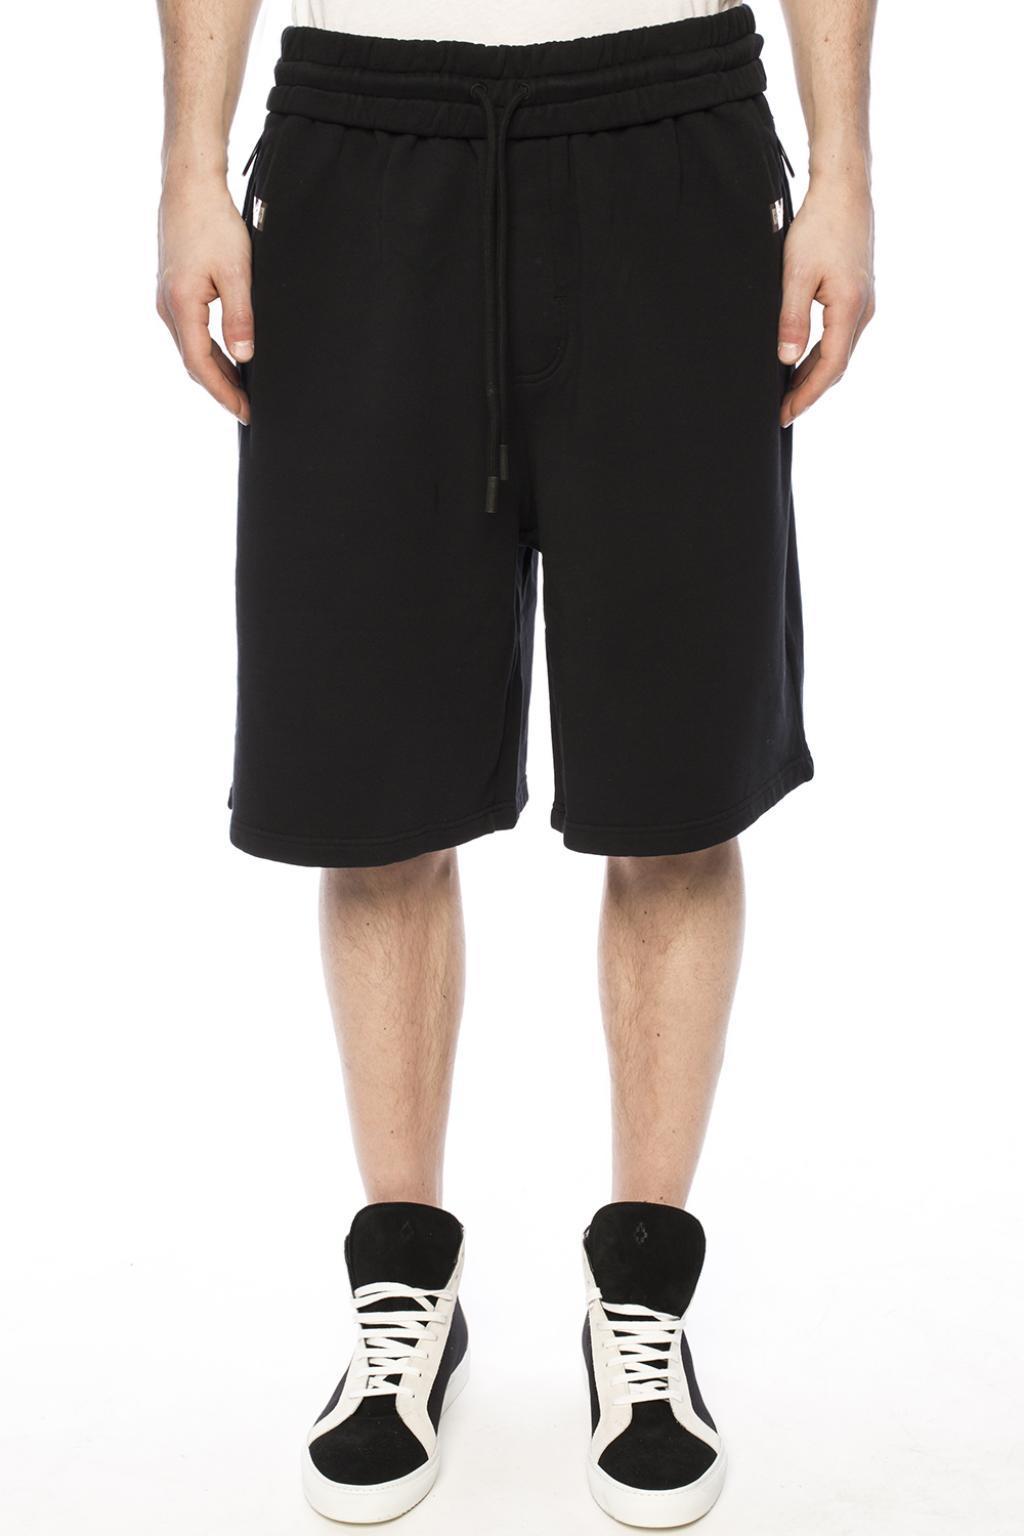 Lyst - Off-White c o Virgil Abloh Sweat Shorts in Black for Men ee9821274